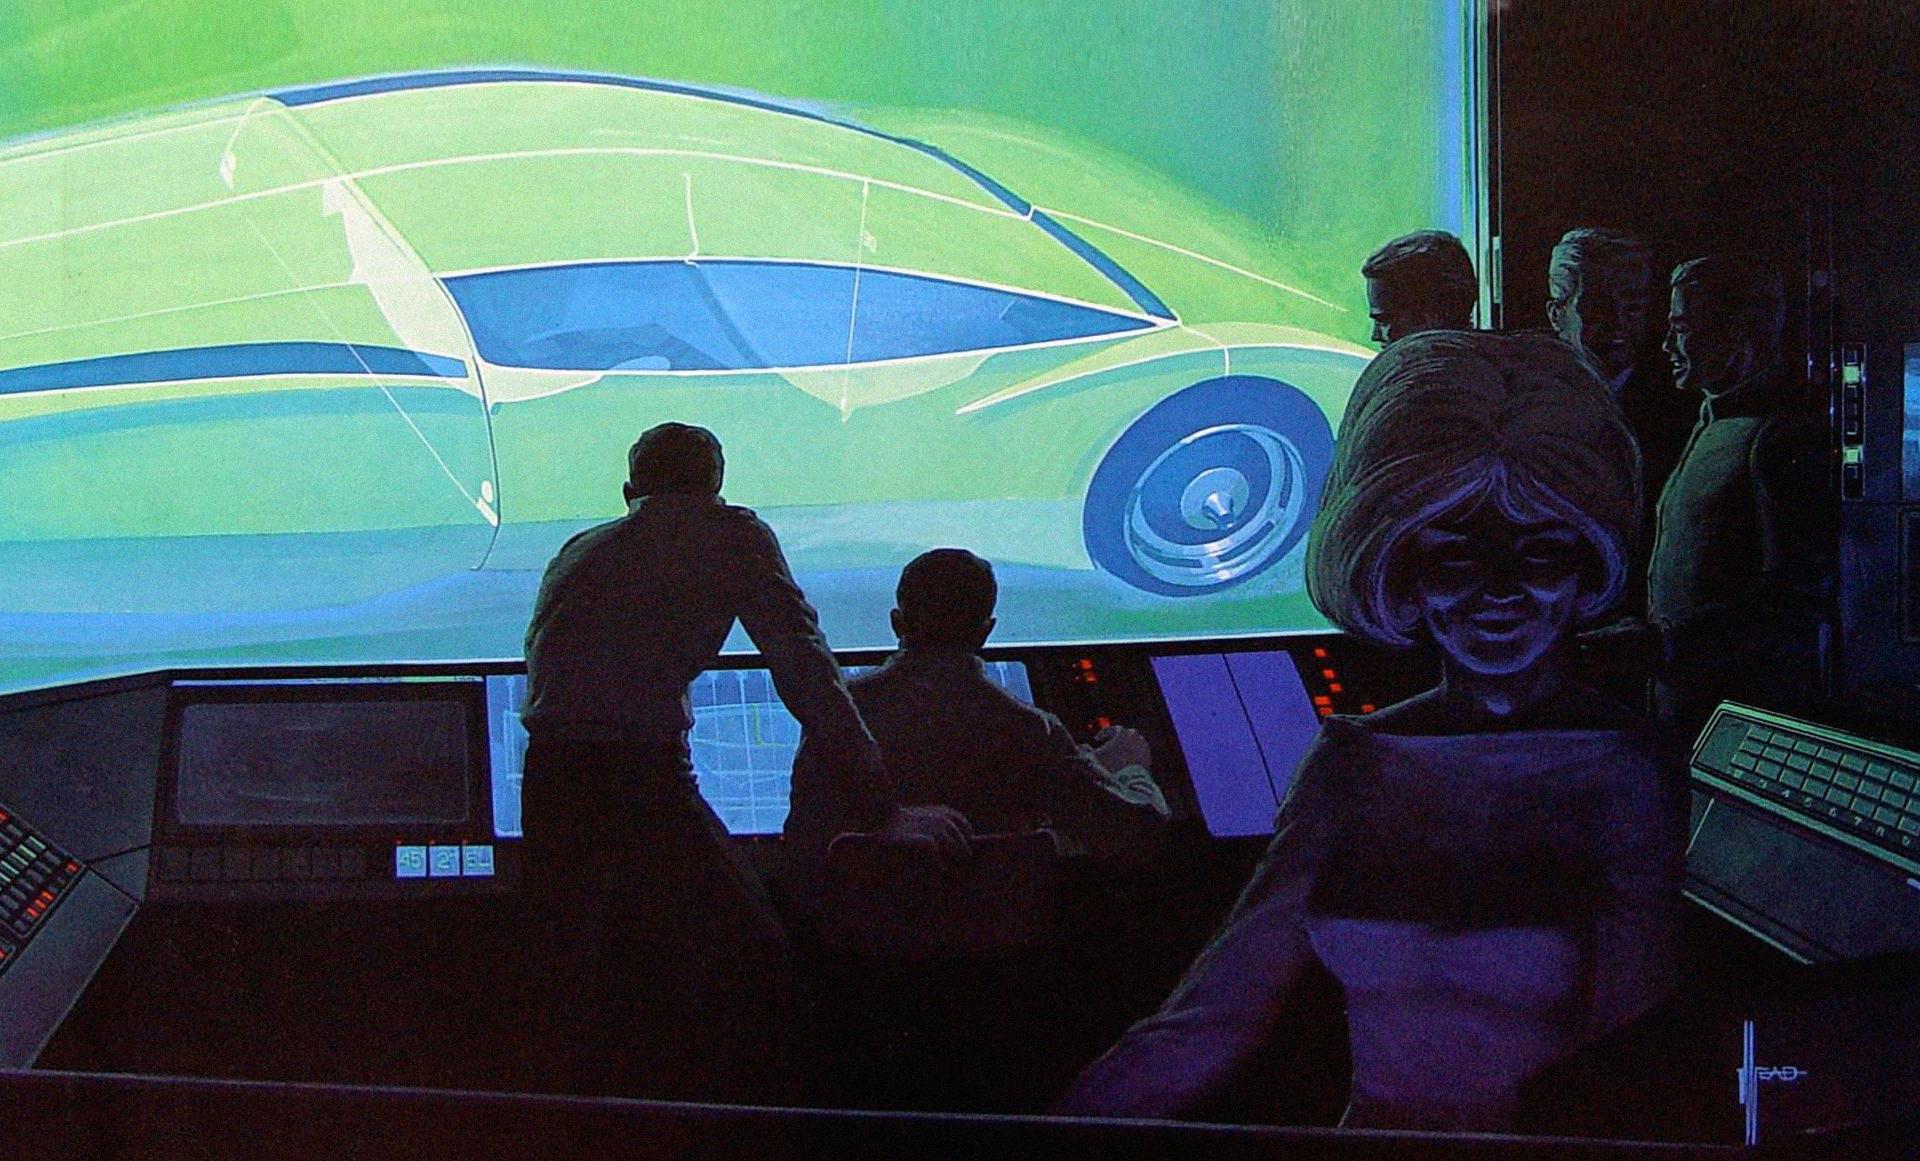 Кино, автопилот и батарейки: какими будут автомобили через 10-20 лет?. Фото 9